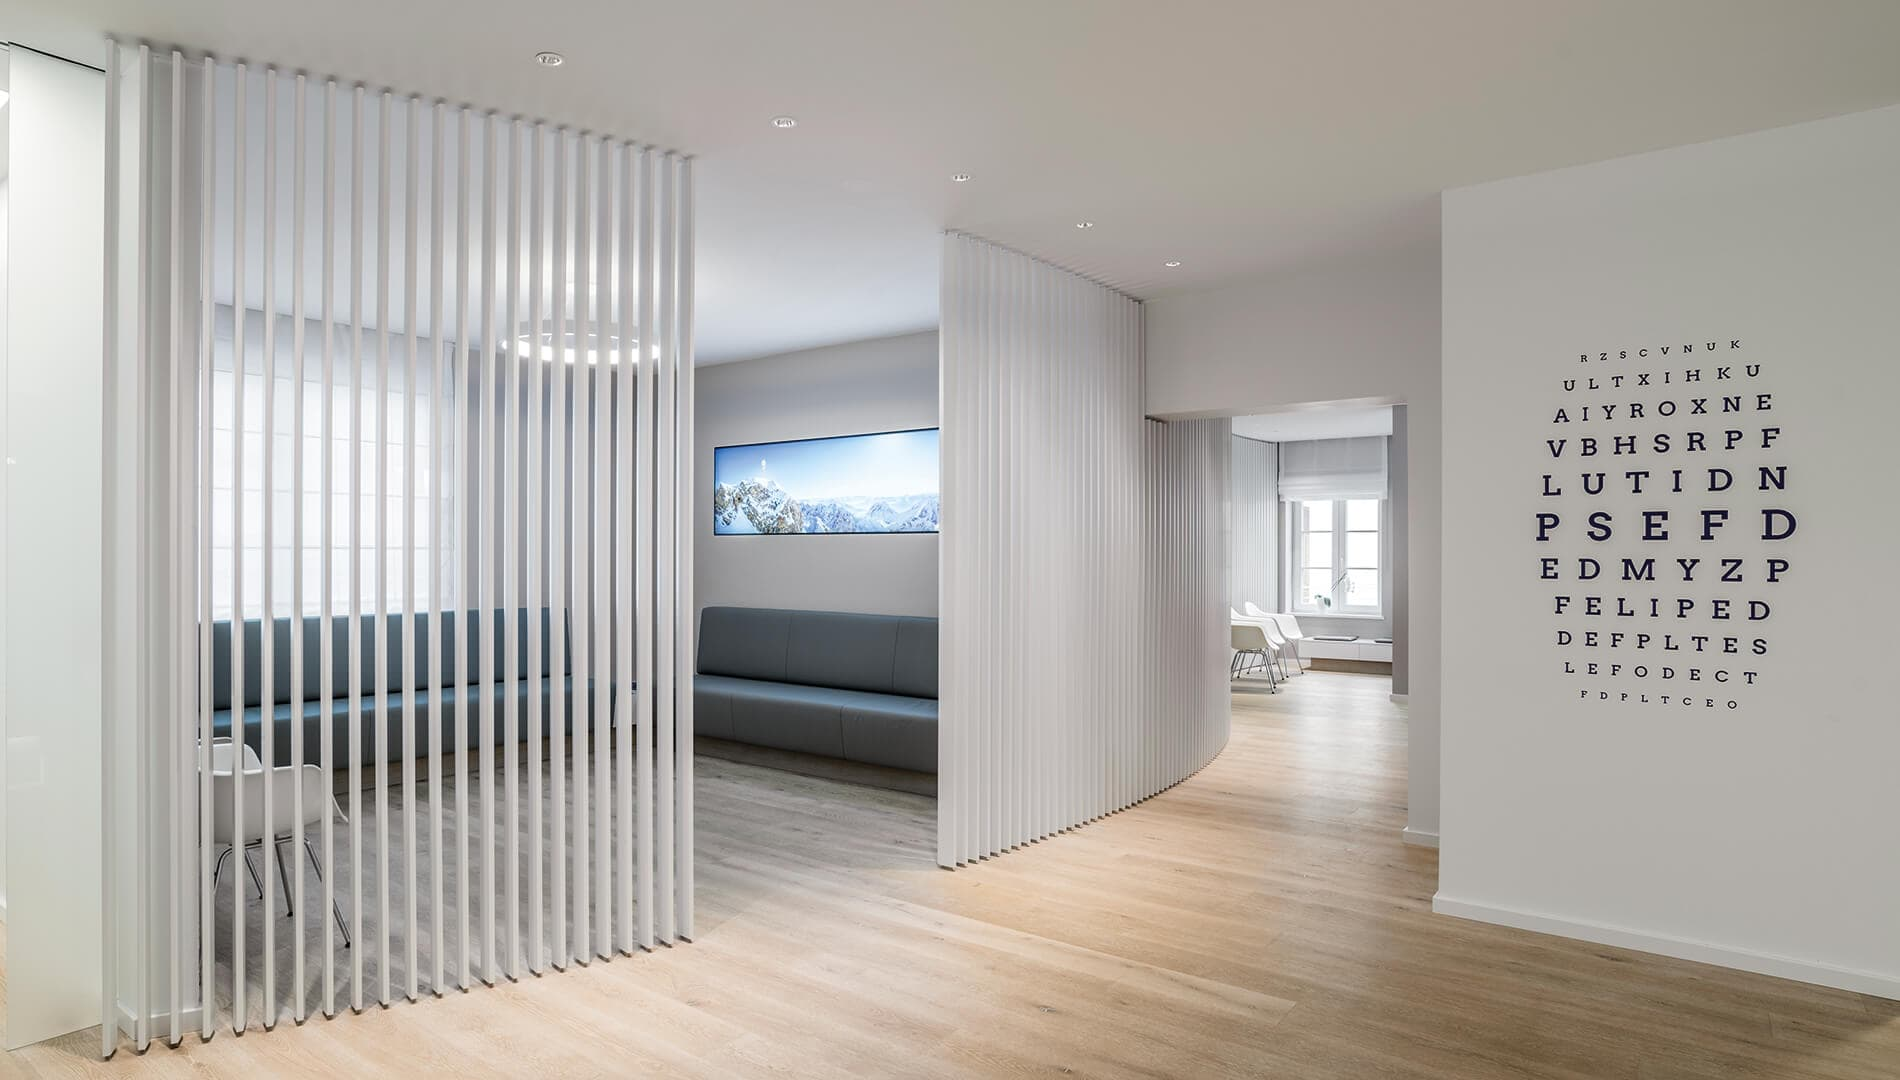 innenarchitektur nc m nchen. Black Bedroom Furniture Sets. Home Design Ideas